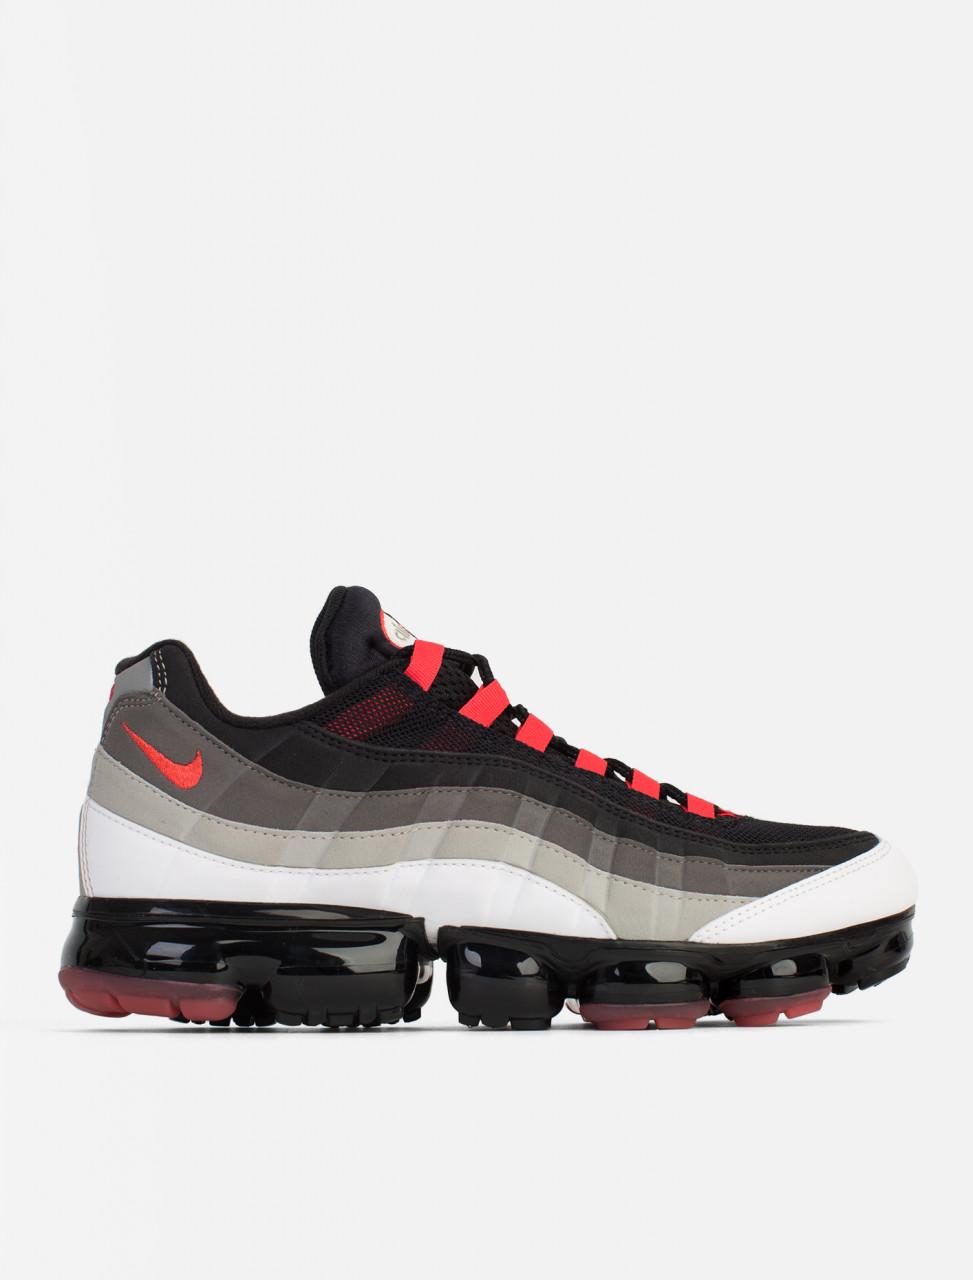 Air Vapormax '95 Sneaker